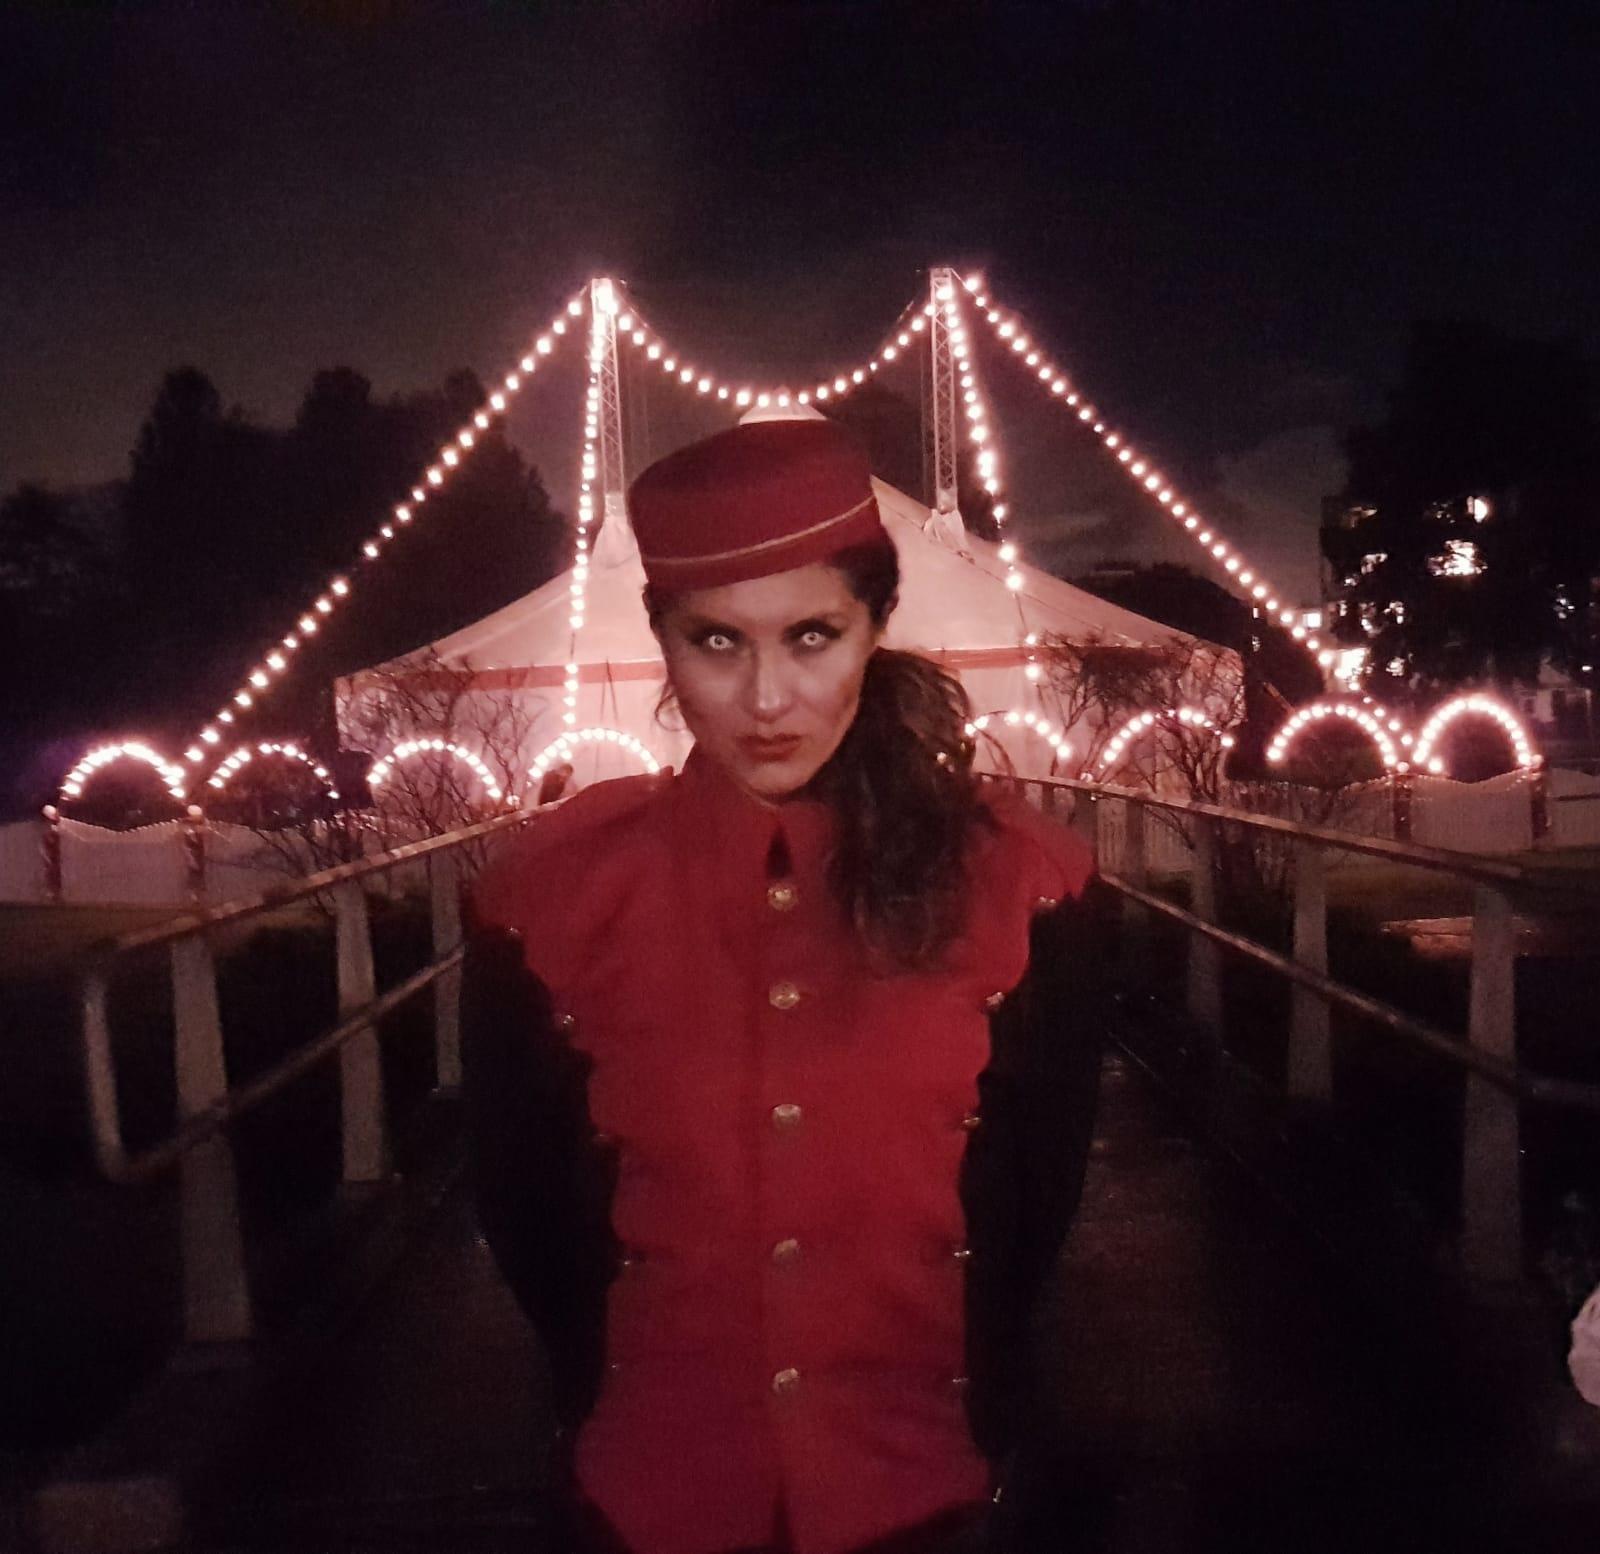 Halloween Circus El Fantasma op Circusweb